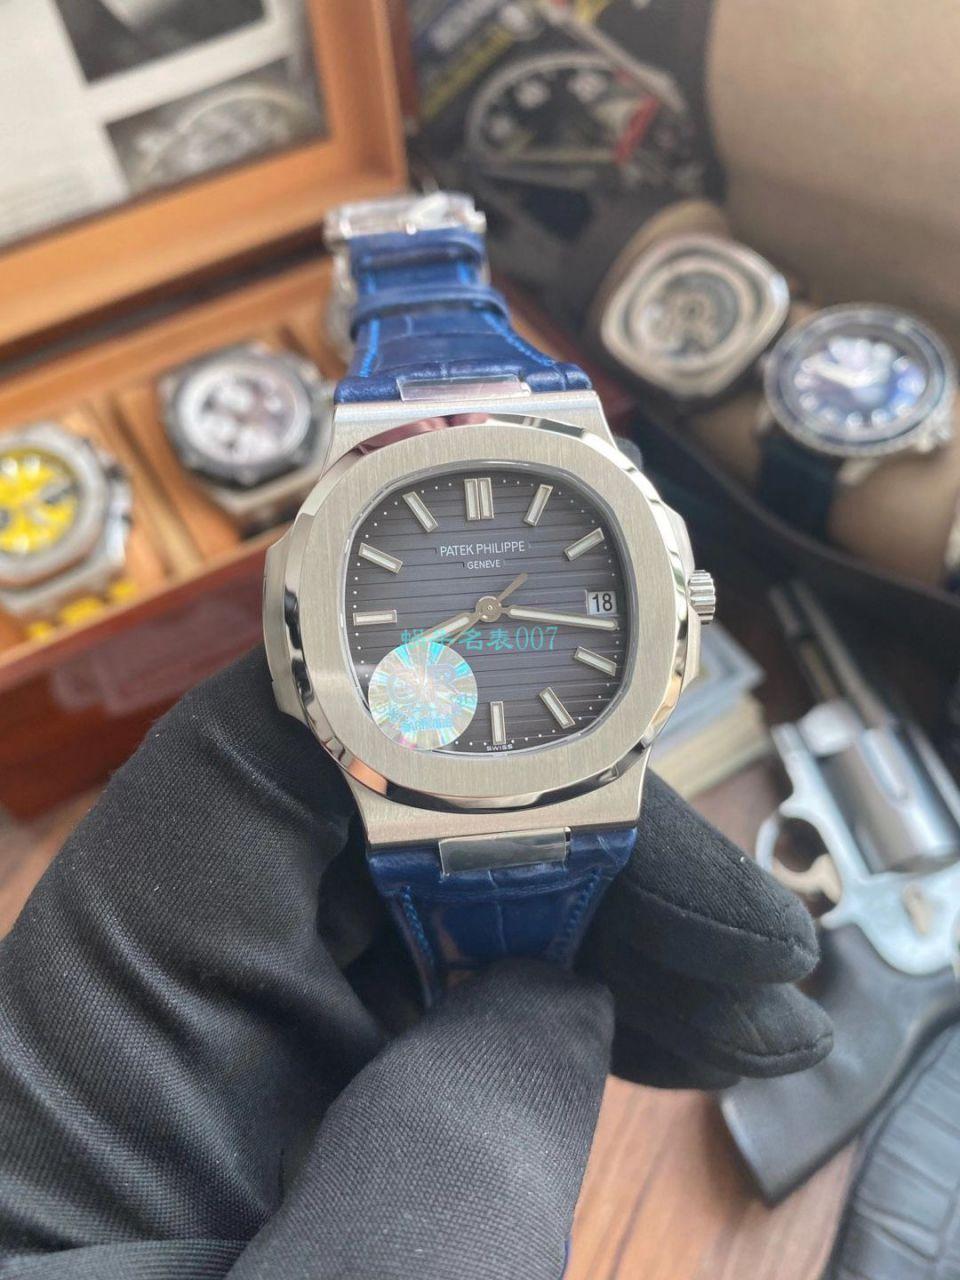 GR厂V2版百达翡丽运动优雅鹦鹉螺超A顶级高仿手表5711/1A 010腕表 / BD350